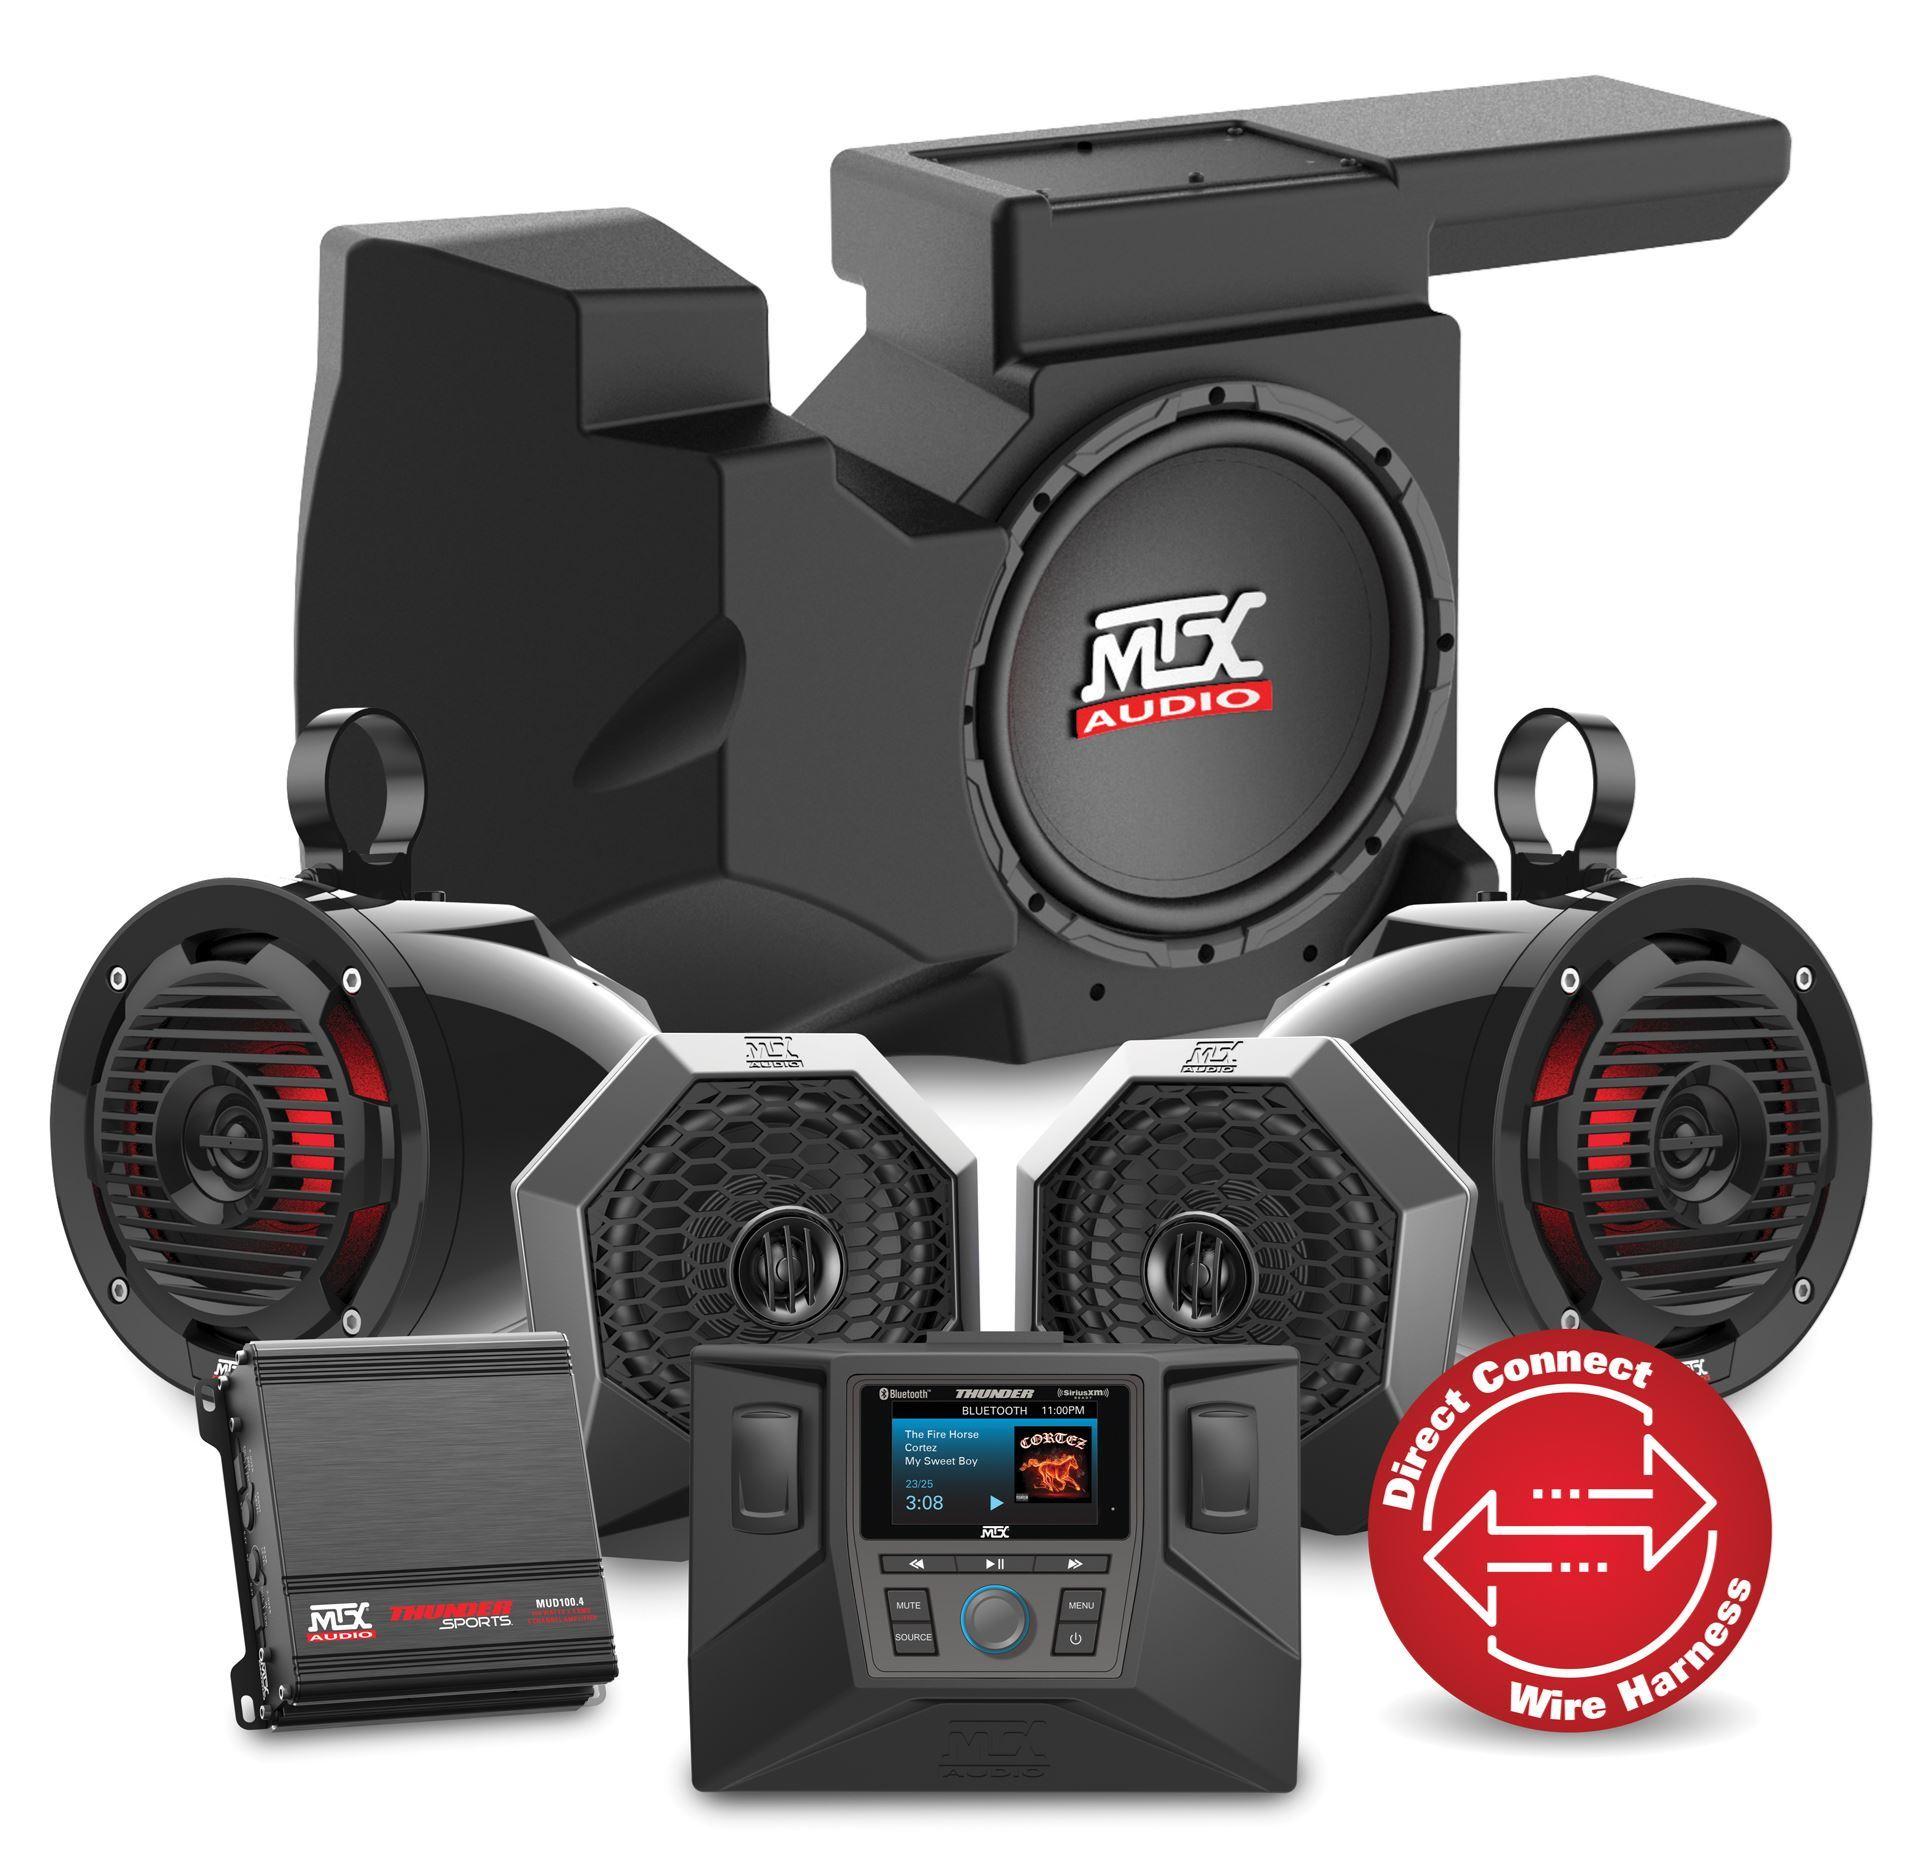 Four Speaker, Dual Amplifier, and Single Subwoofer Polaris RZR Audio System